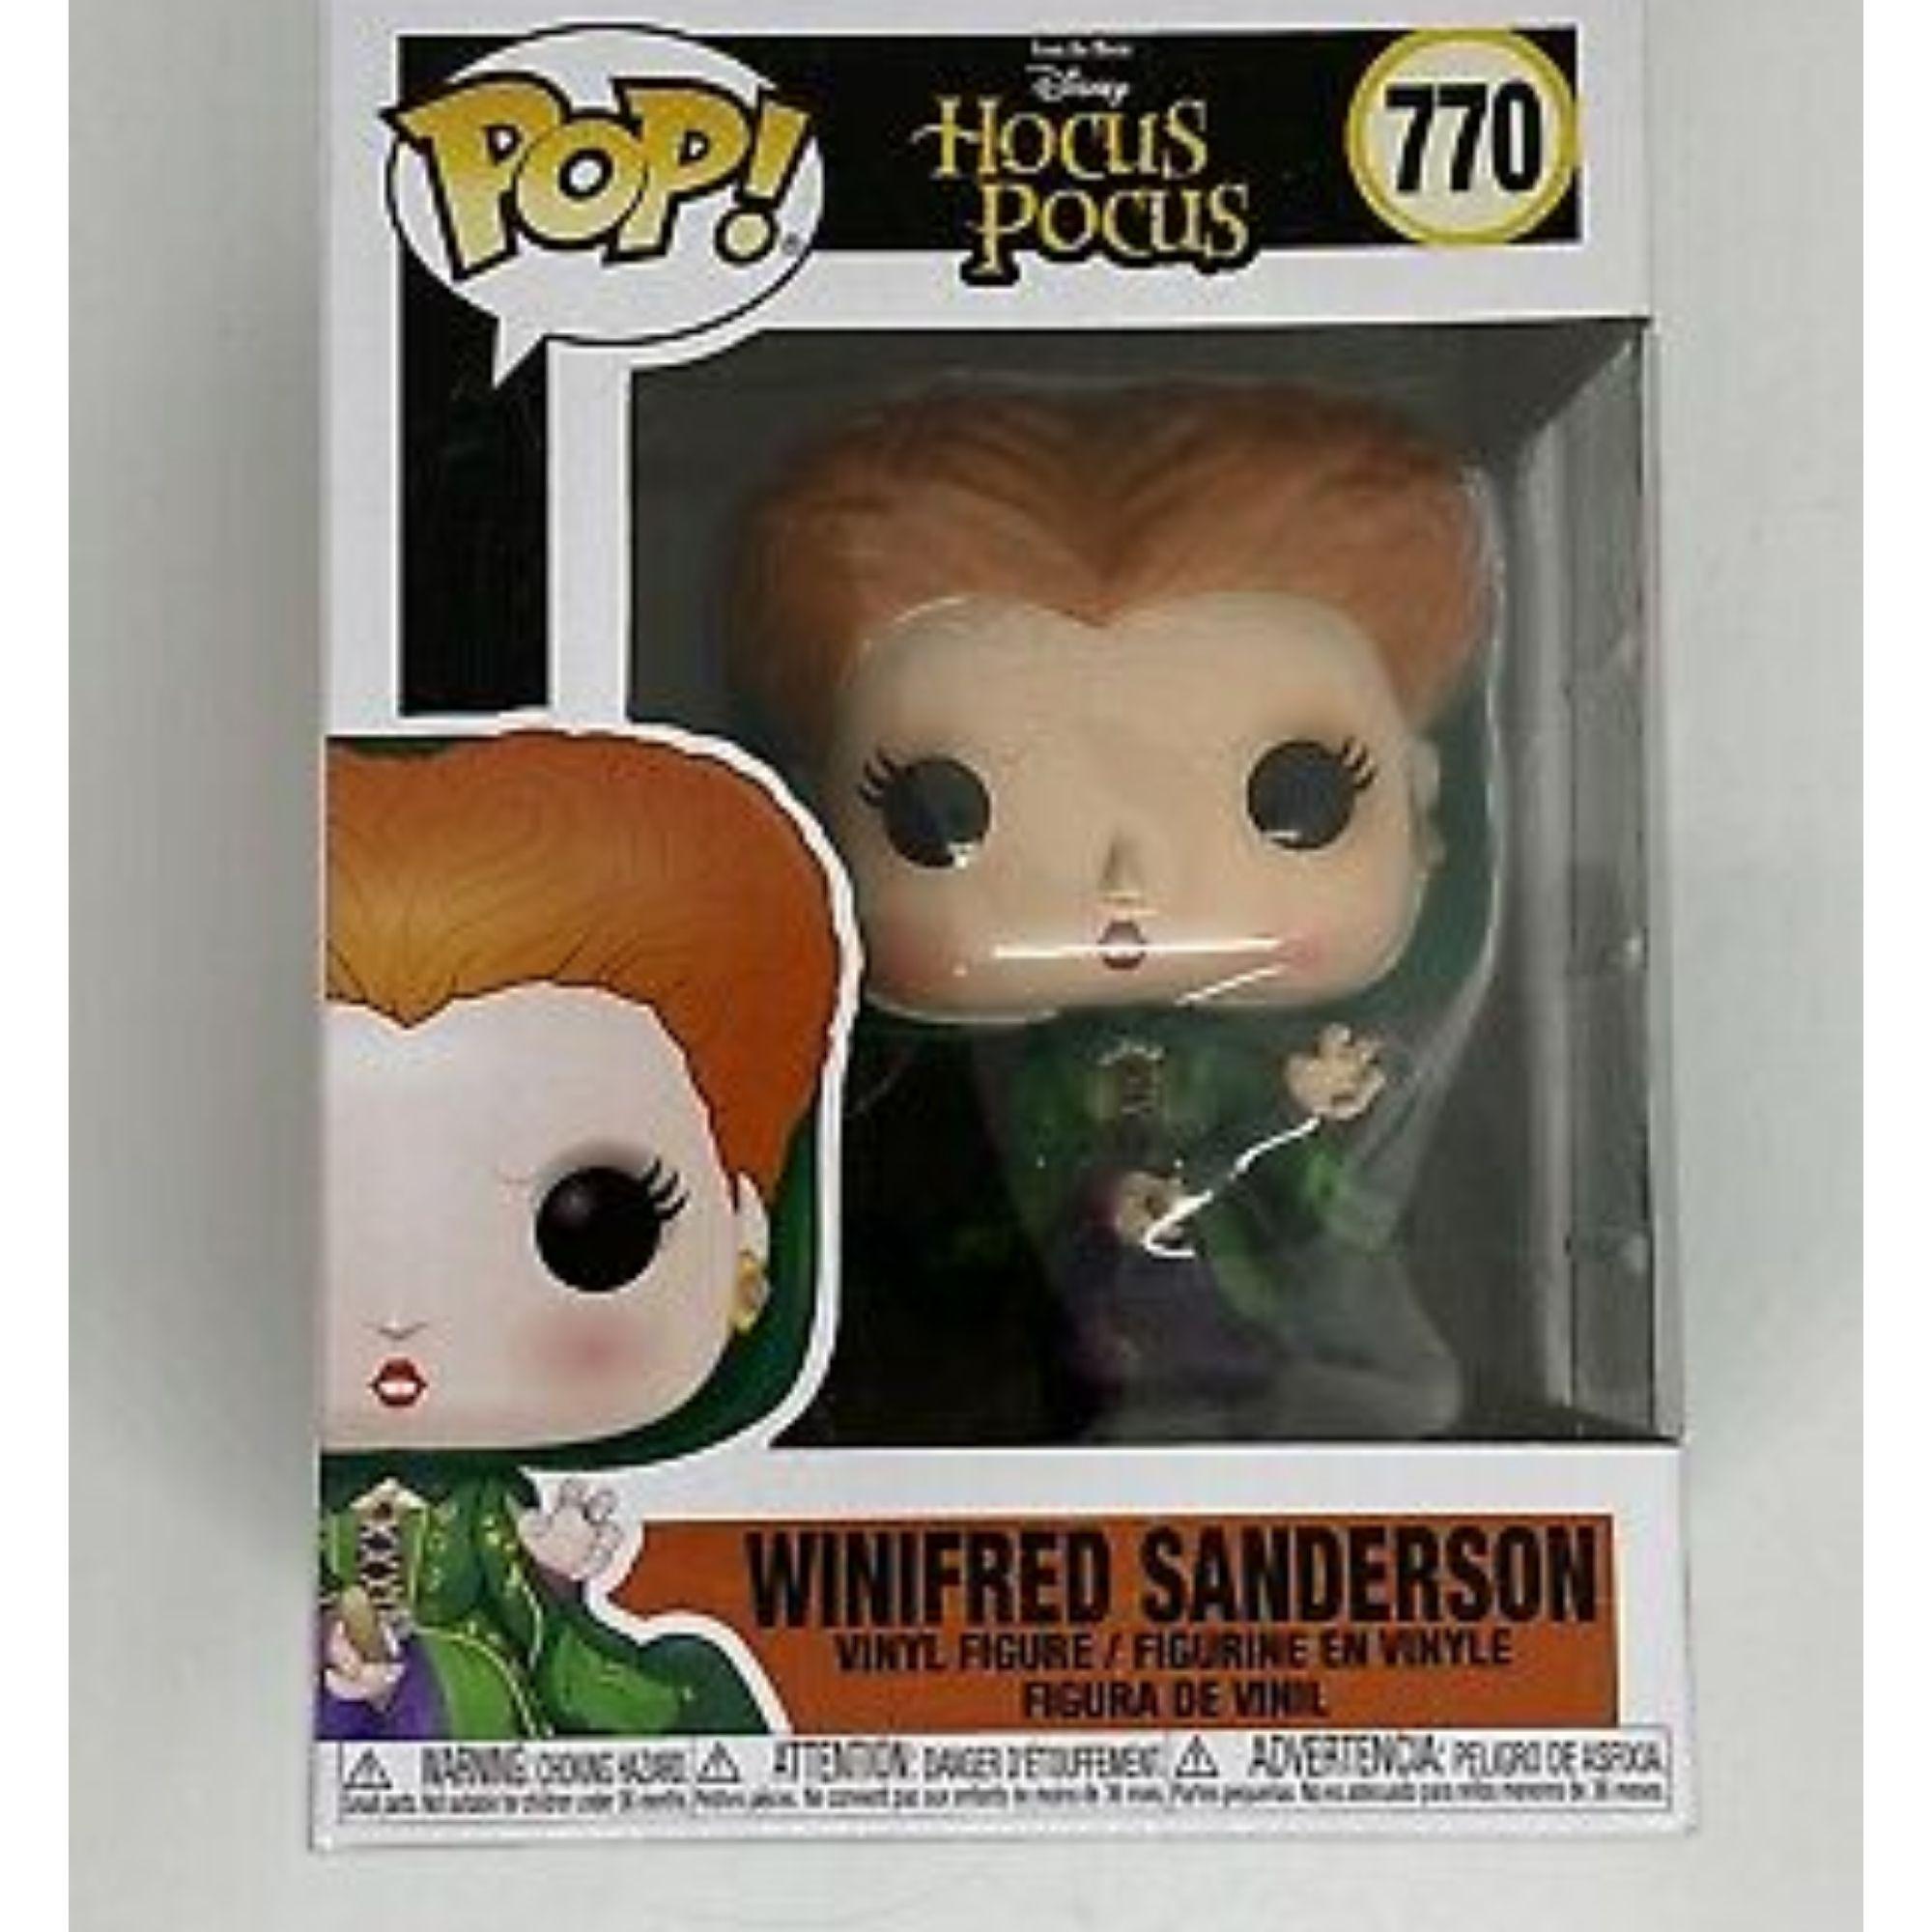 Funko Pop Hocus Pocus Flying Winifred Sanderson #770  - Game Land Brinquedos